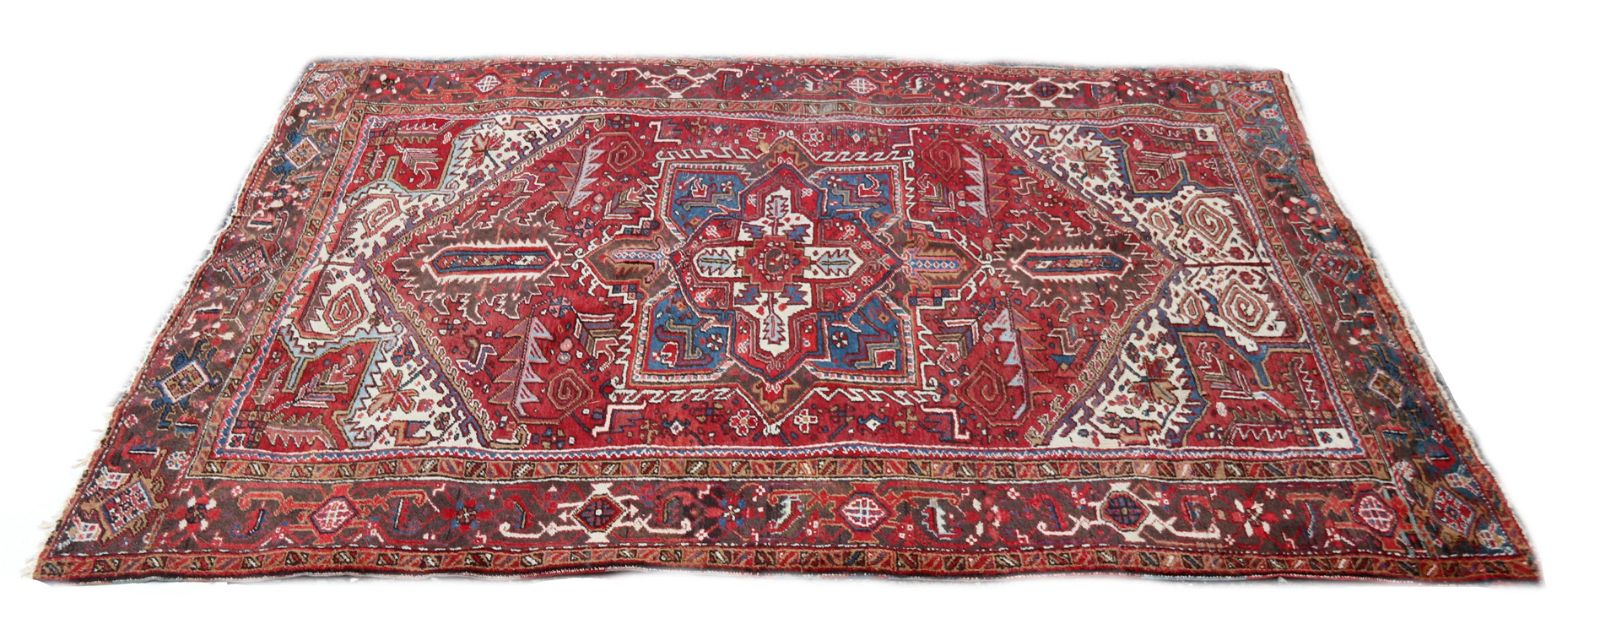 A Room Size Persian Rug, Heriz